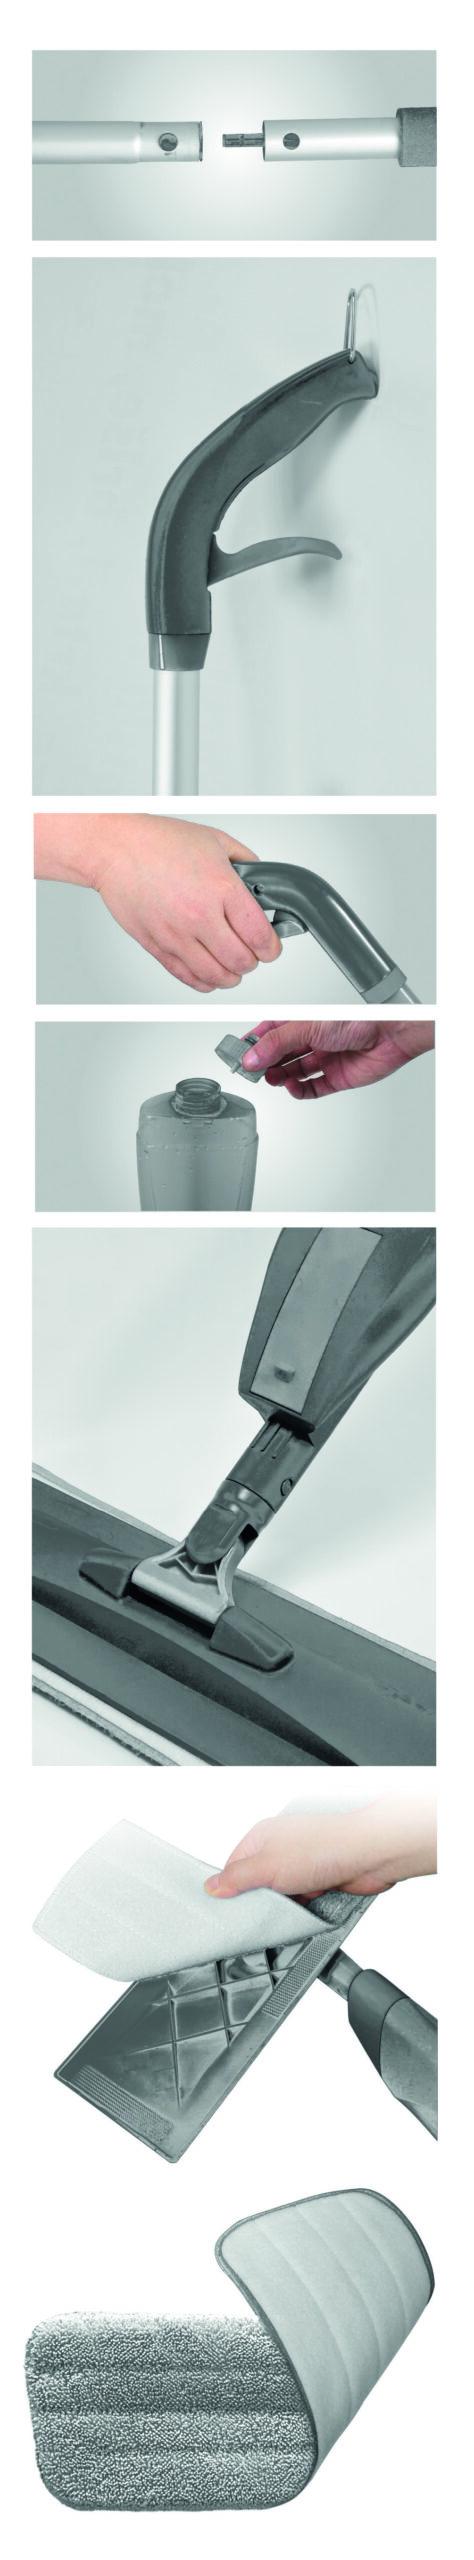 Spray Mop opis